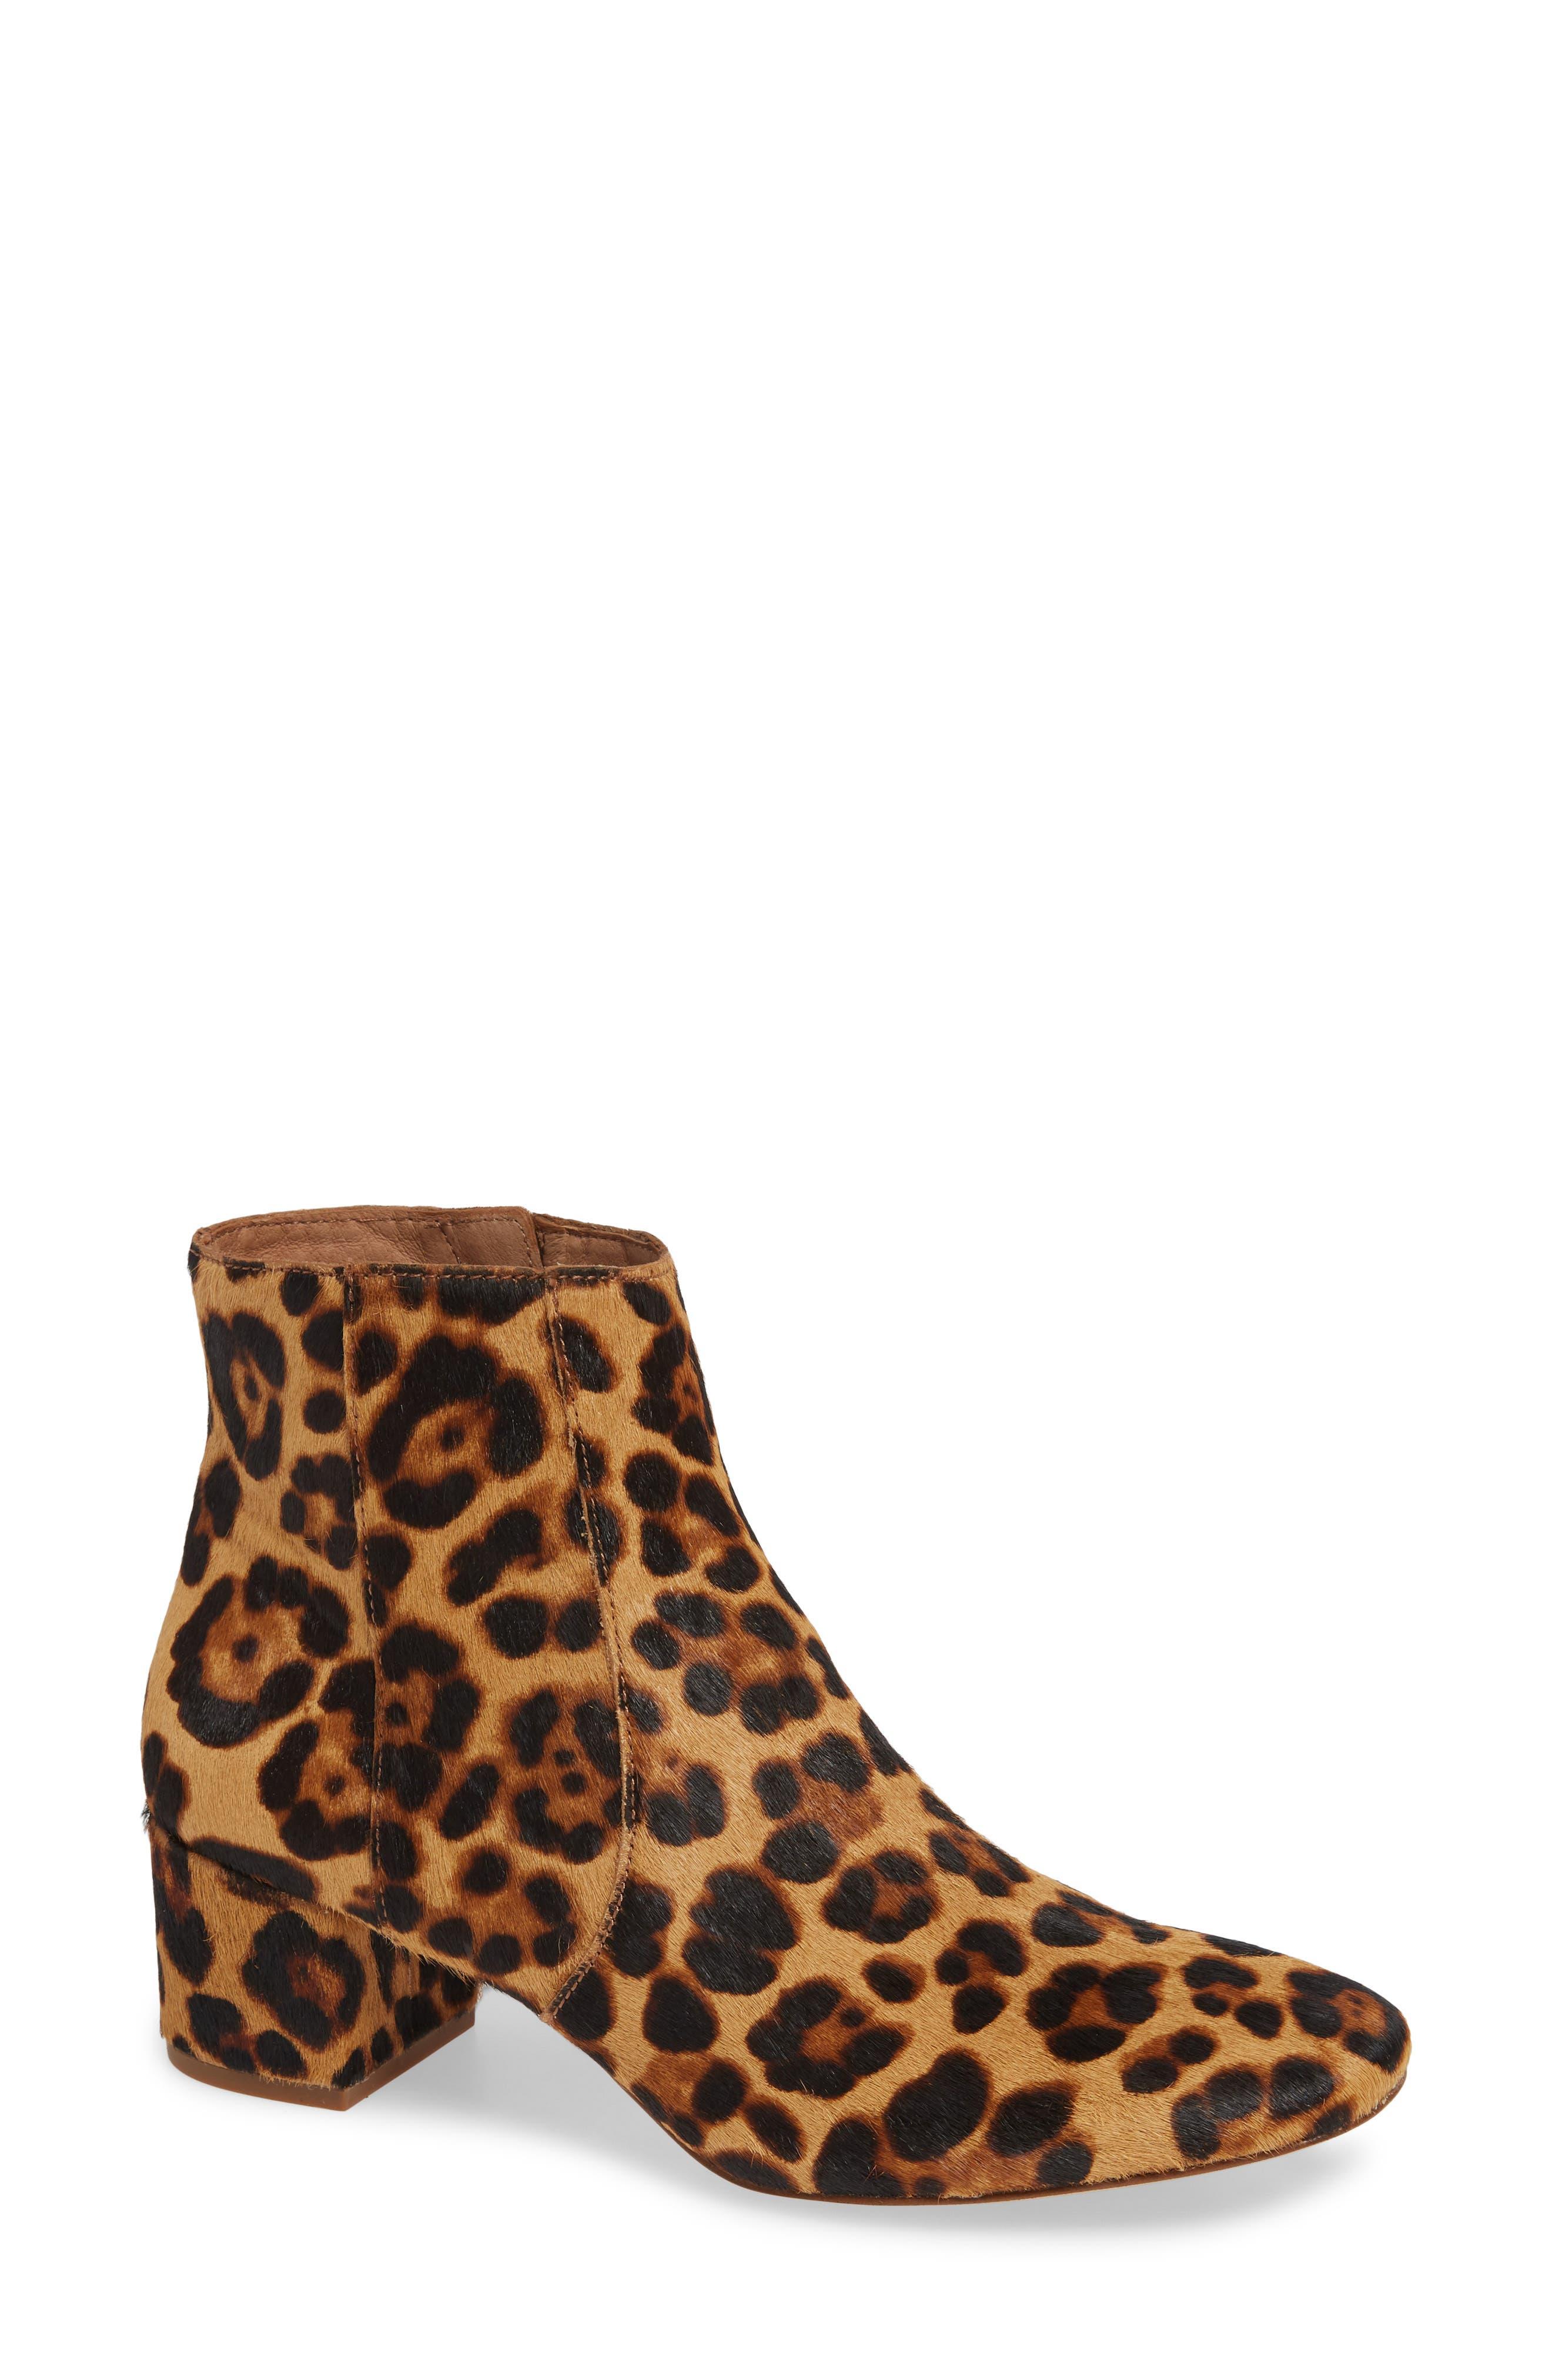 MADEWELL, The Jada Genuine Calf Hair Boot, Main thumbnail 1, color, 200